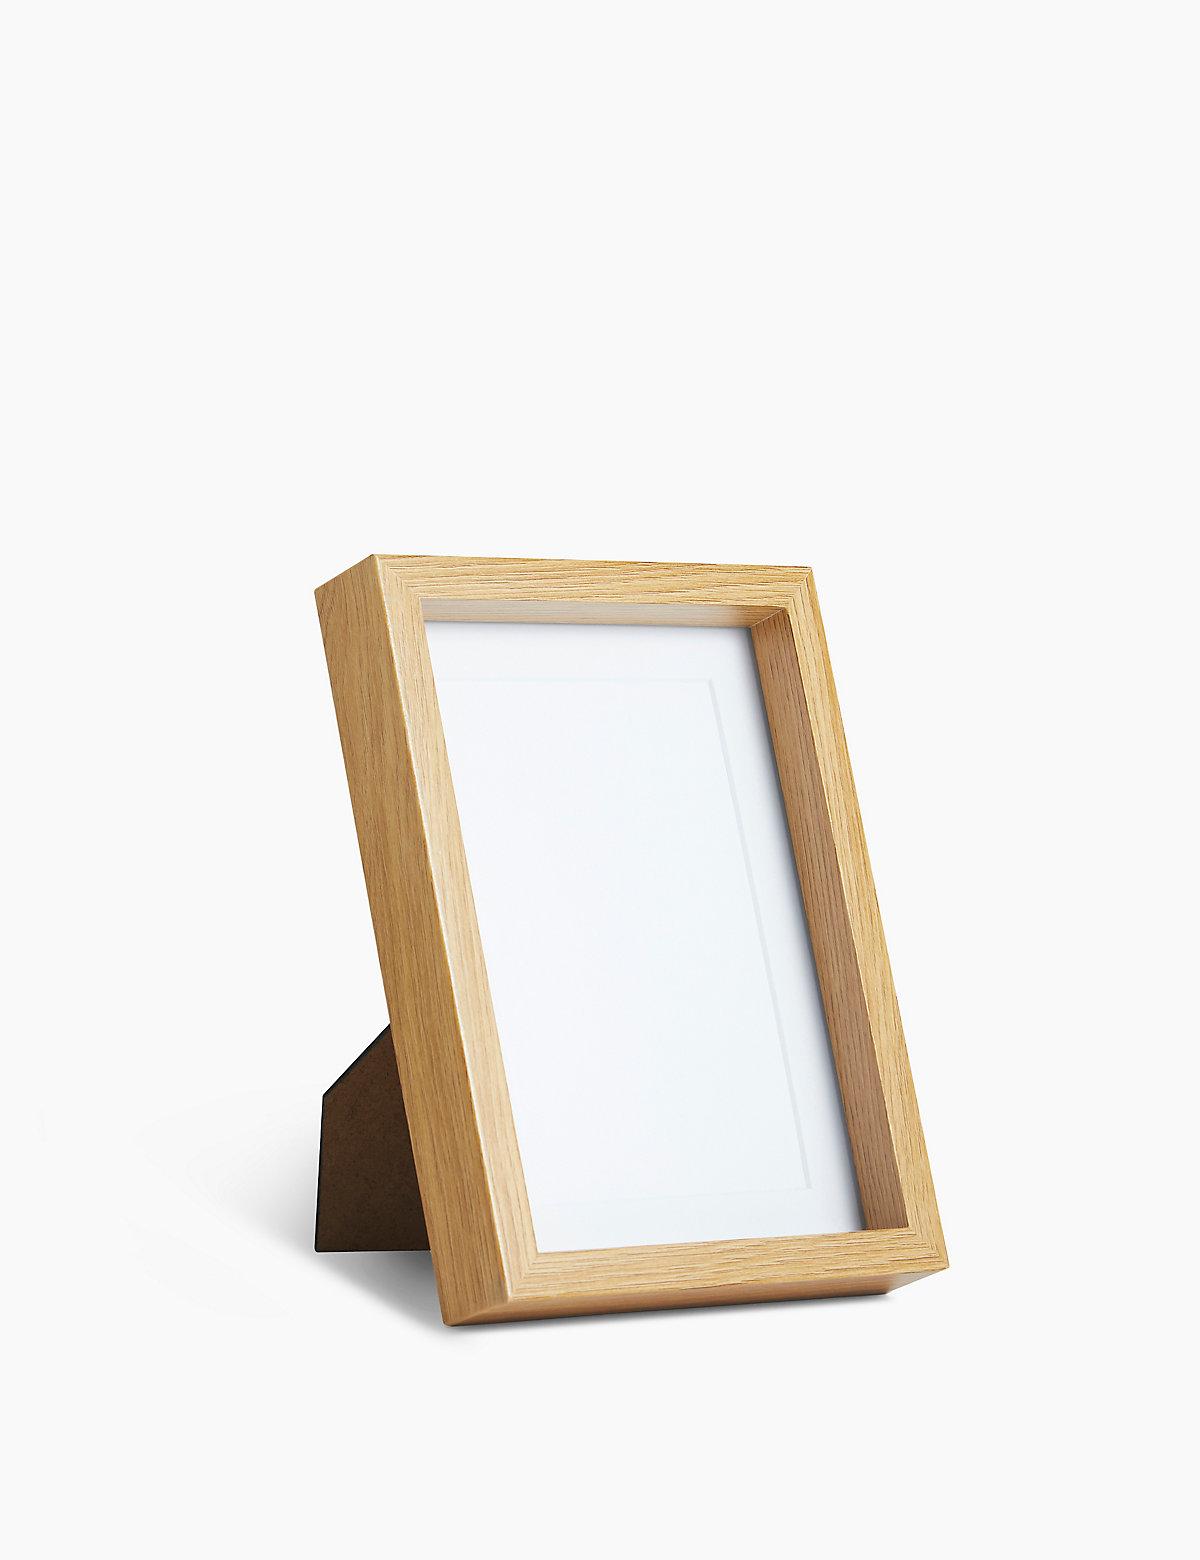 Wilko Photo Frame Oak and White Wood Effect 6 x 4in Wilko 10cm x photo frame